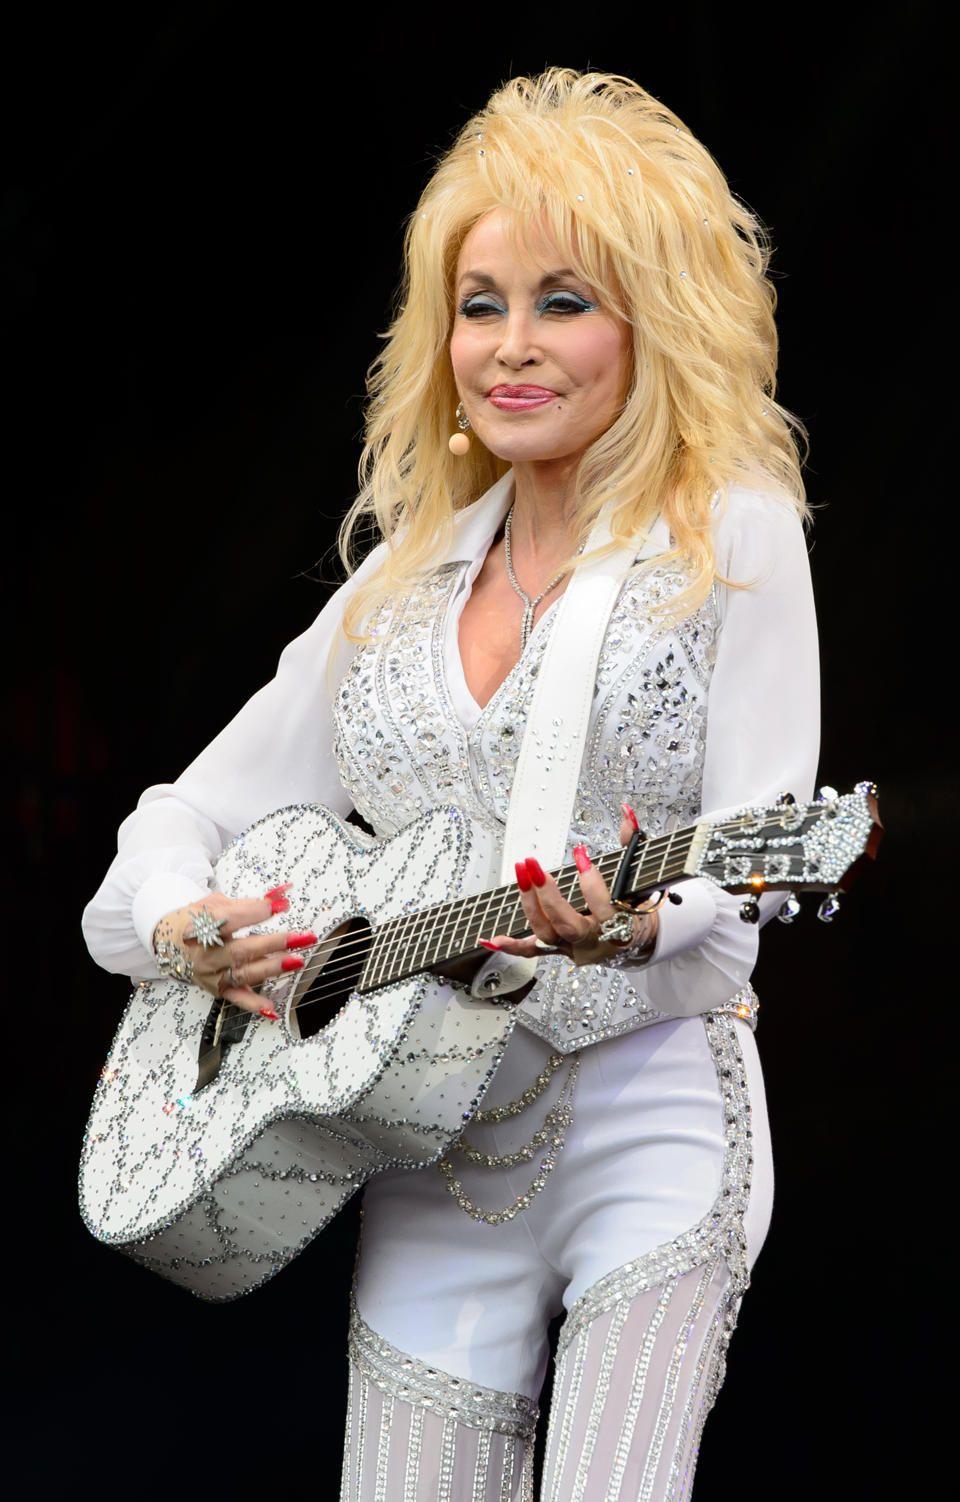 Dolly Parton Thrills Crowd Glastonbury Festival - Yahoo